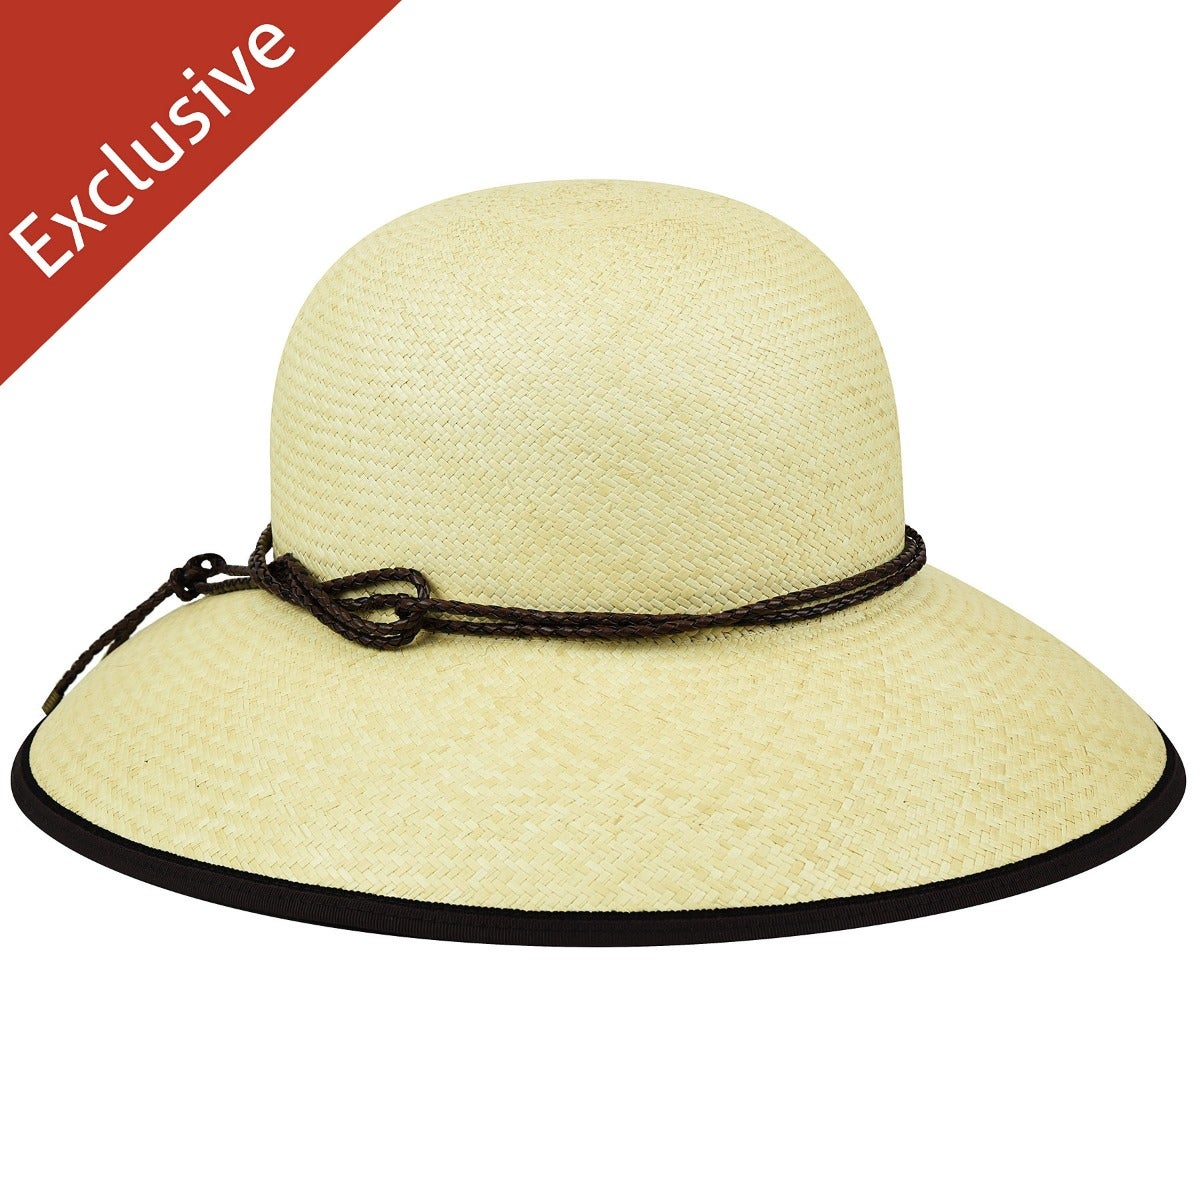 Lil W. Wide Brim Hat - Exclusive - Natural/S